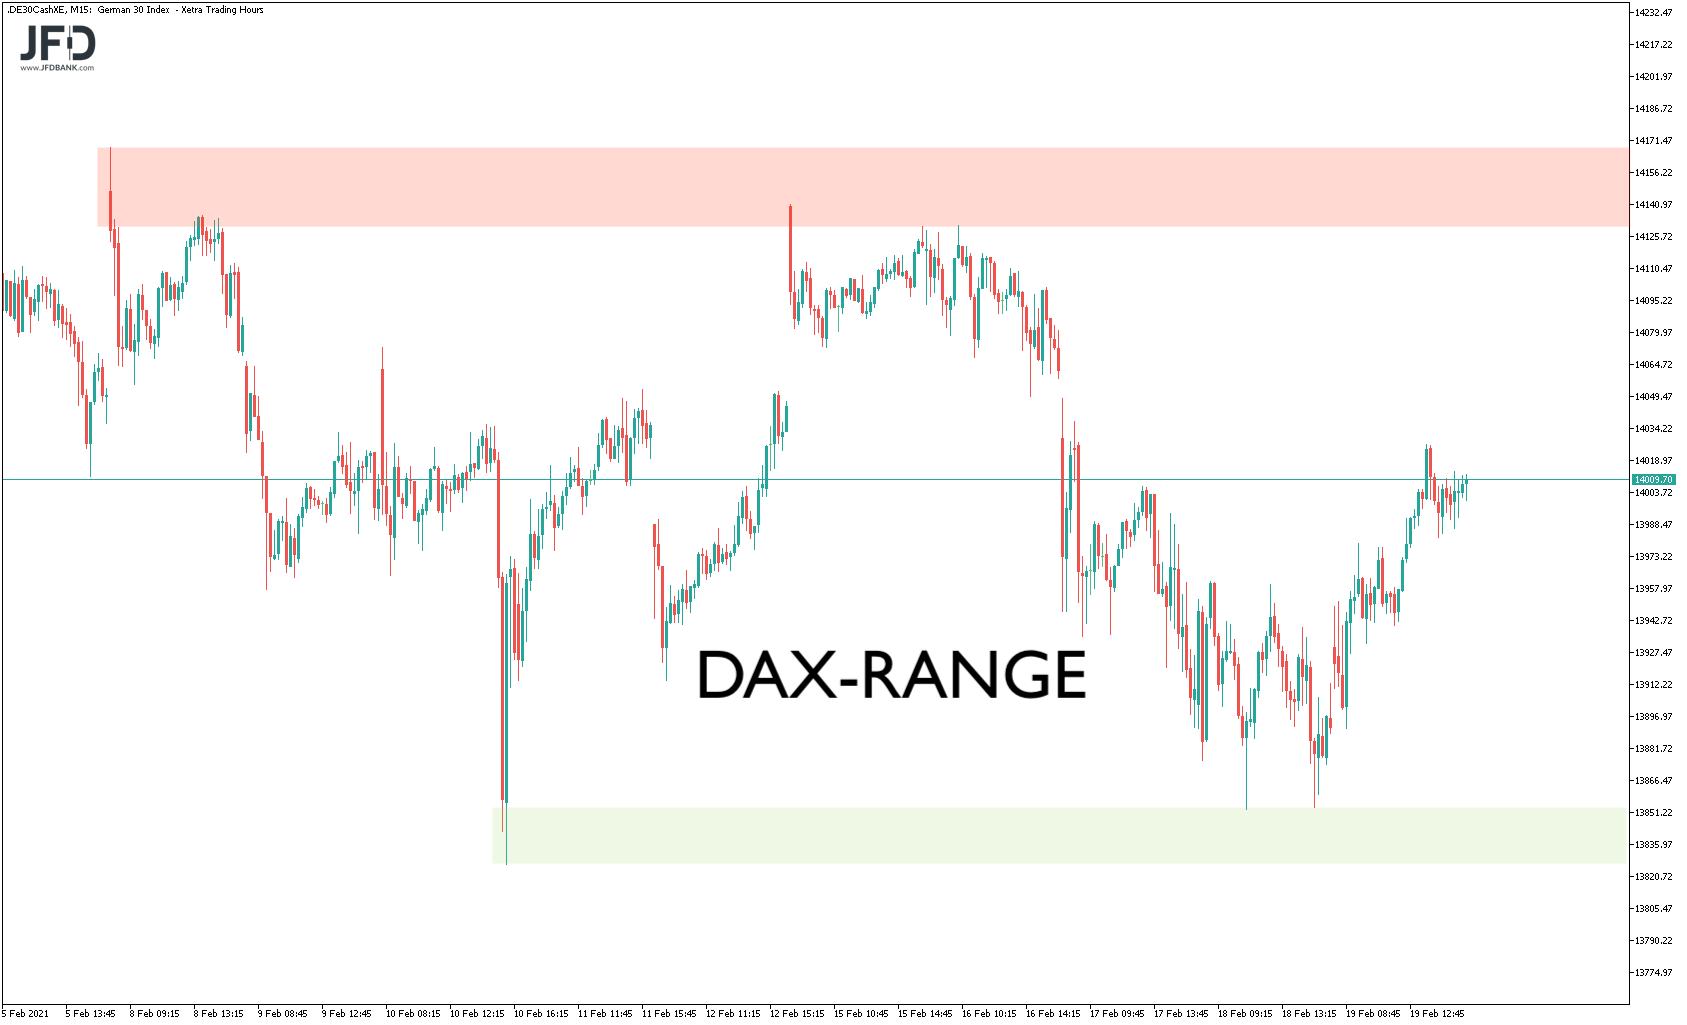 DAX-Range im kurzfristigen Chartbild